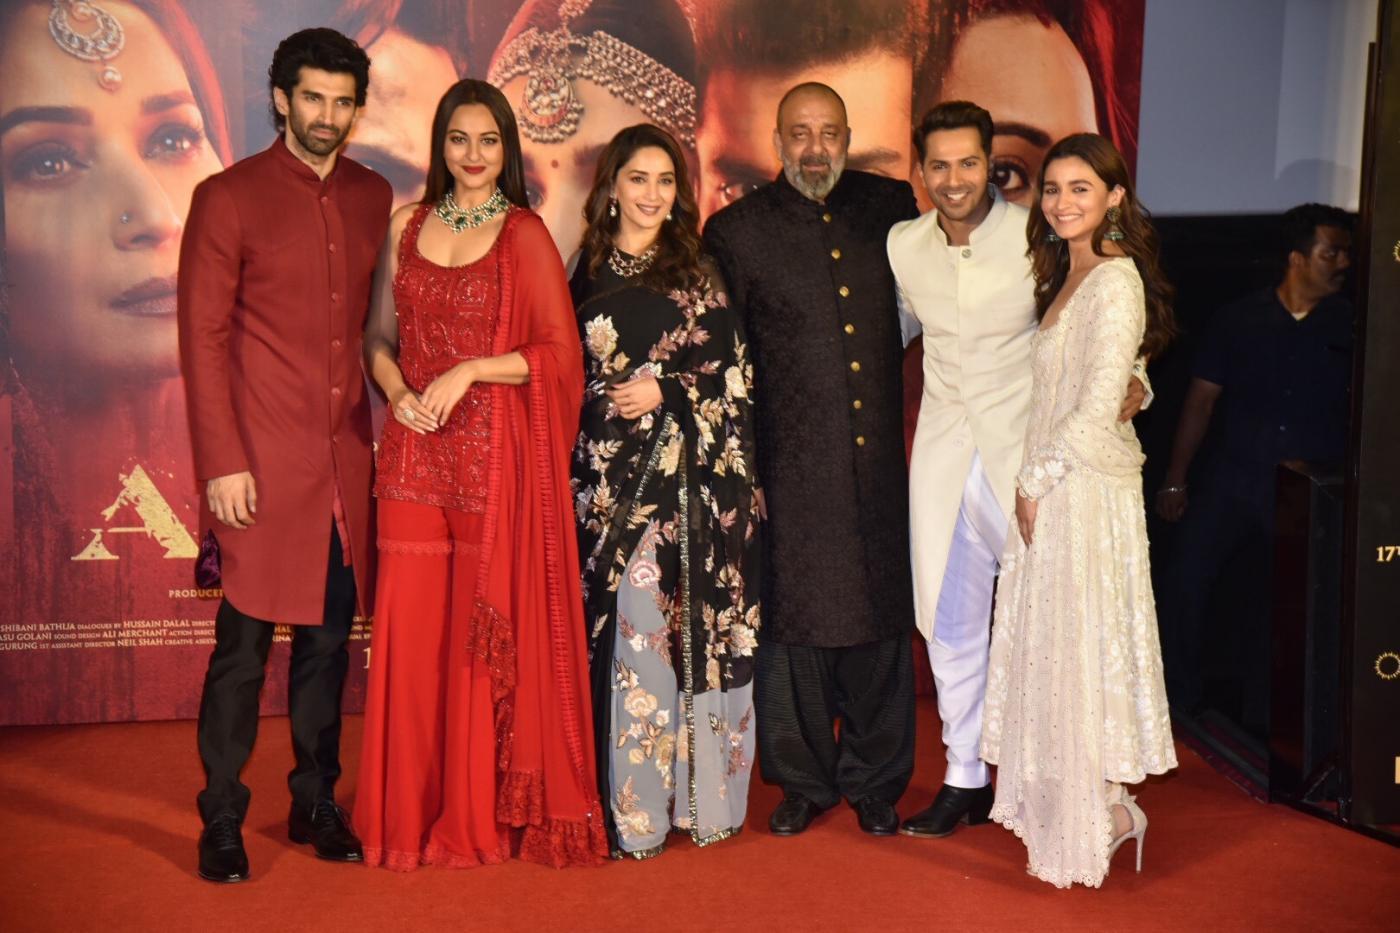 "Mumbai: Actors Aditya Roy Kapoor, Sonakshi Sinha, Madhuri Dixit Nene, Sanjay Dutt, Alia Bhatt and Varun Dhawan at the teaser launch of their upcoming film ""Kalank"" in Mumbai, on March 12, 2019. (Photo: IANS) by ."